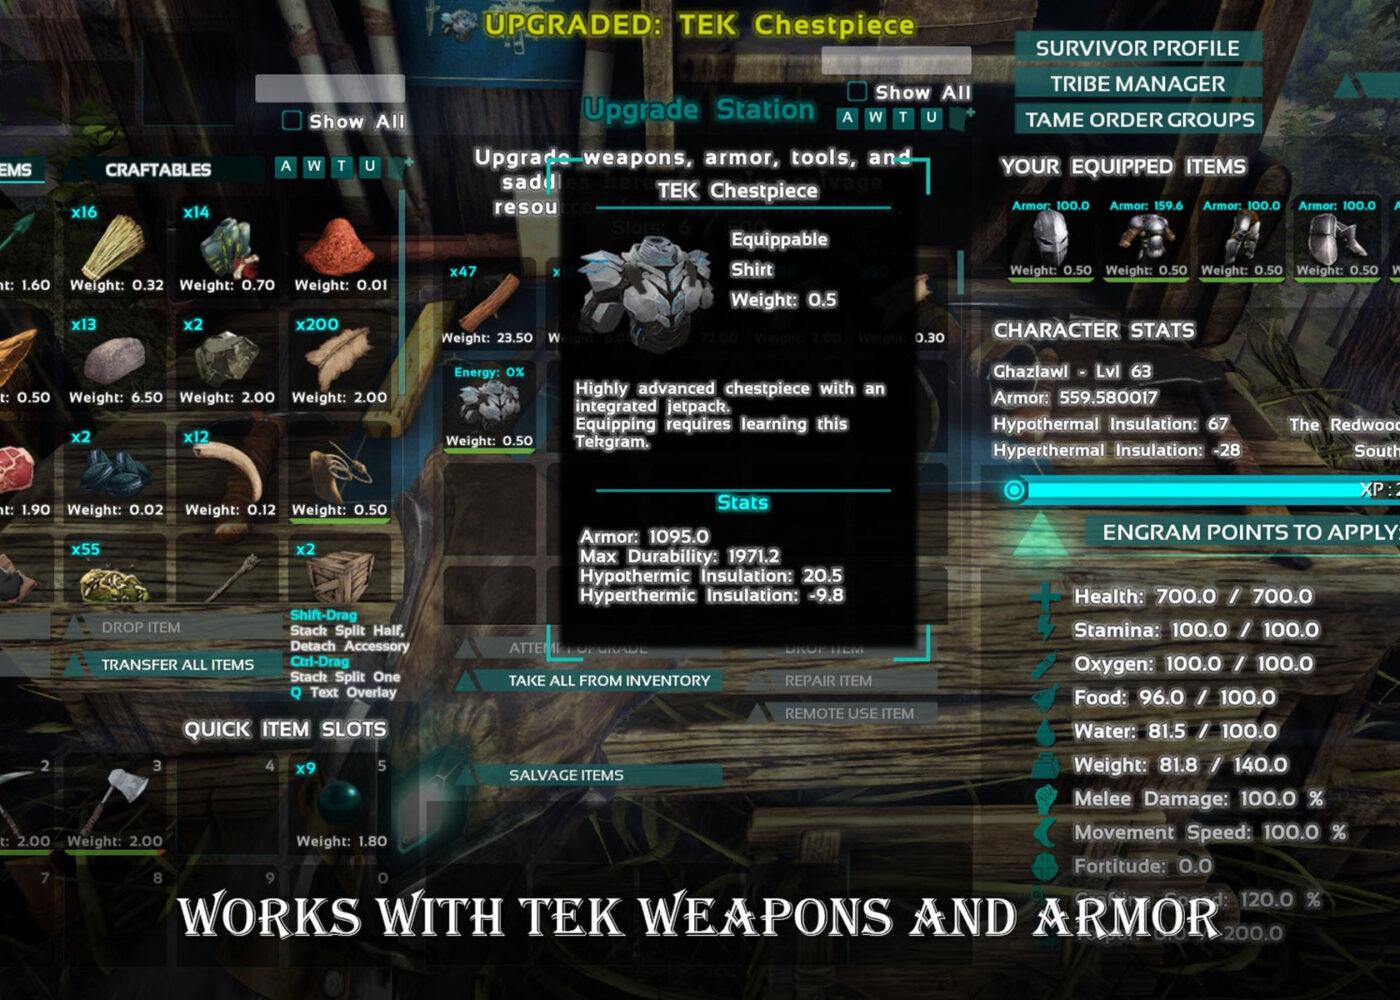 ark-upgrade-station-2